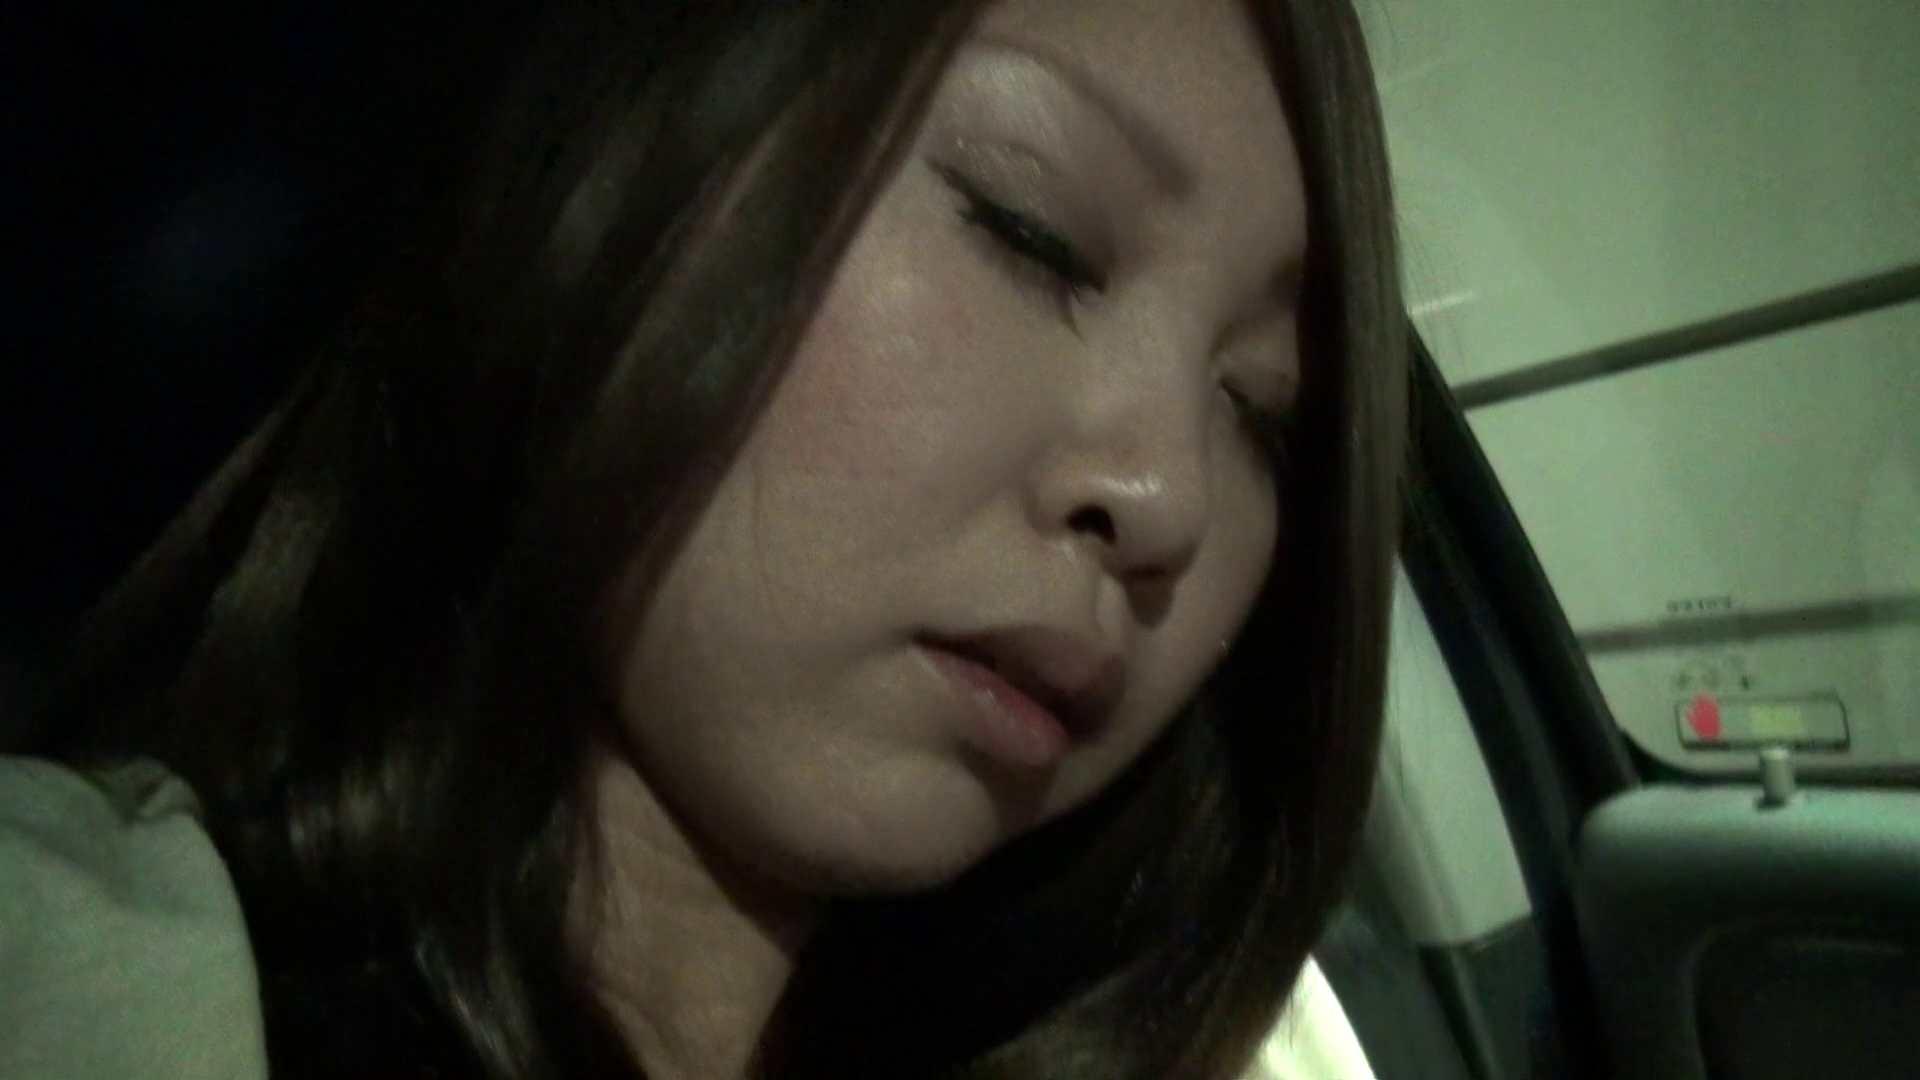 episode6 ドライブ中に・・・妻に強せいオナニー オナニー  106pic 44